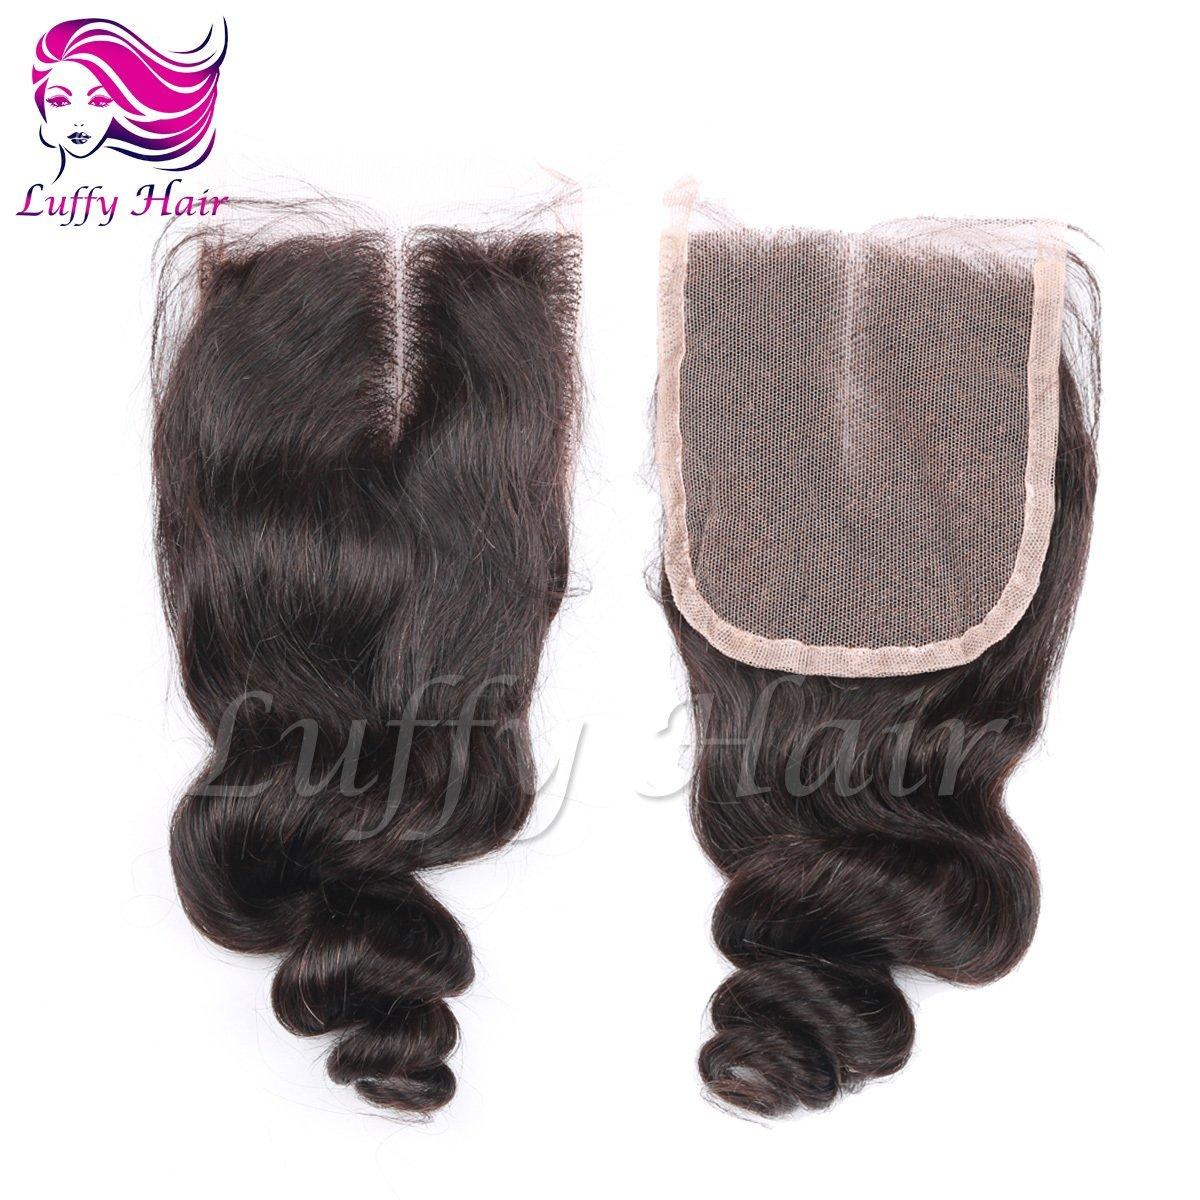 8A Virgin Human Hair 4x4 Body Wave 180% Density Lace Closure- KCL006